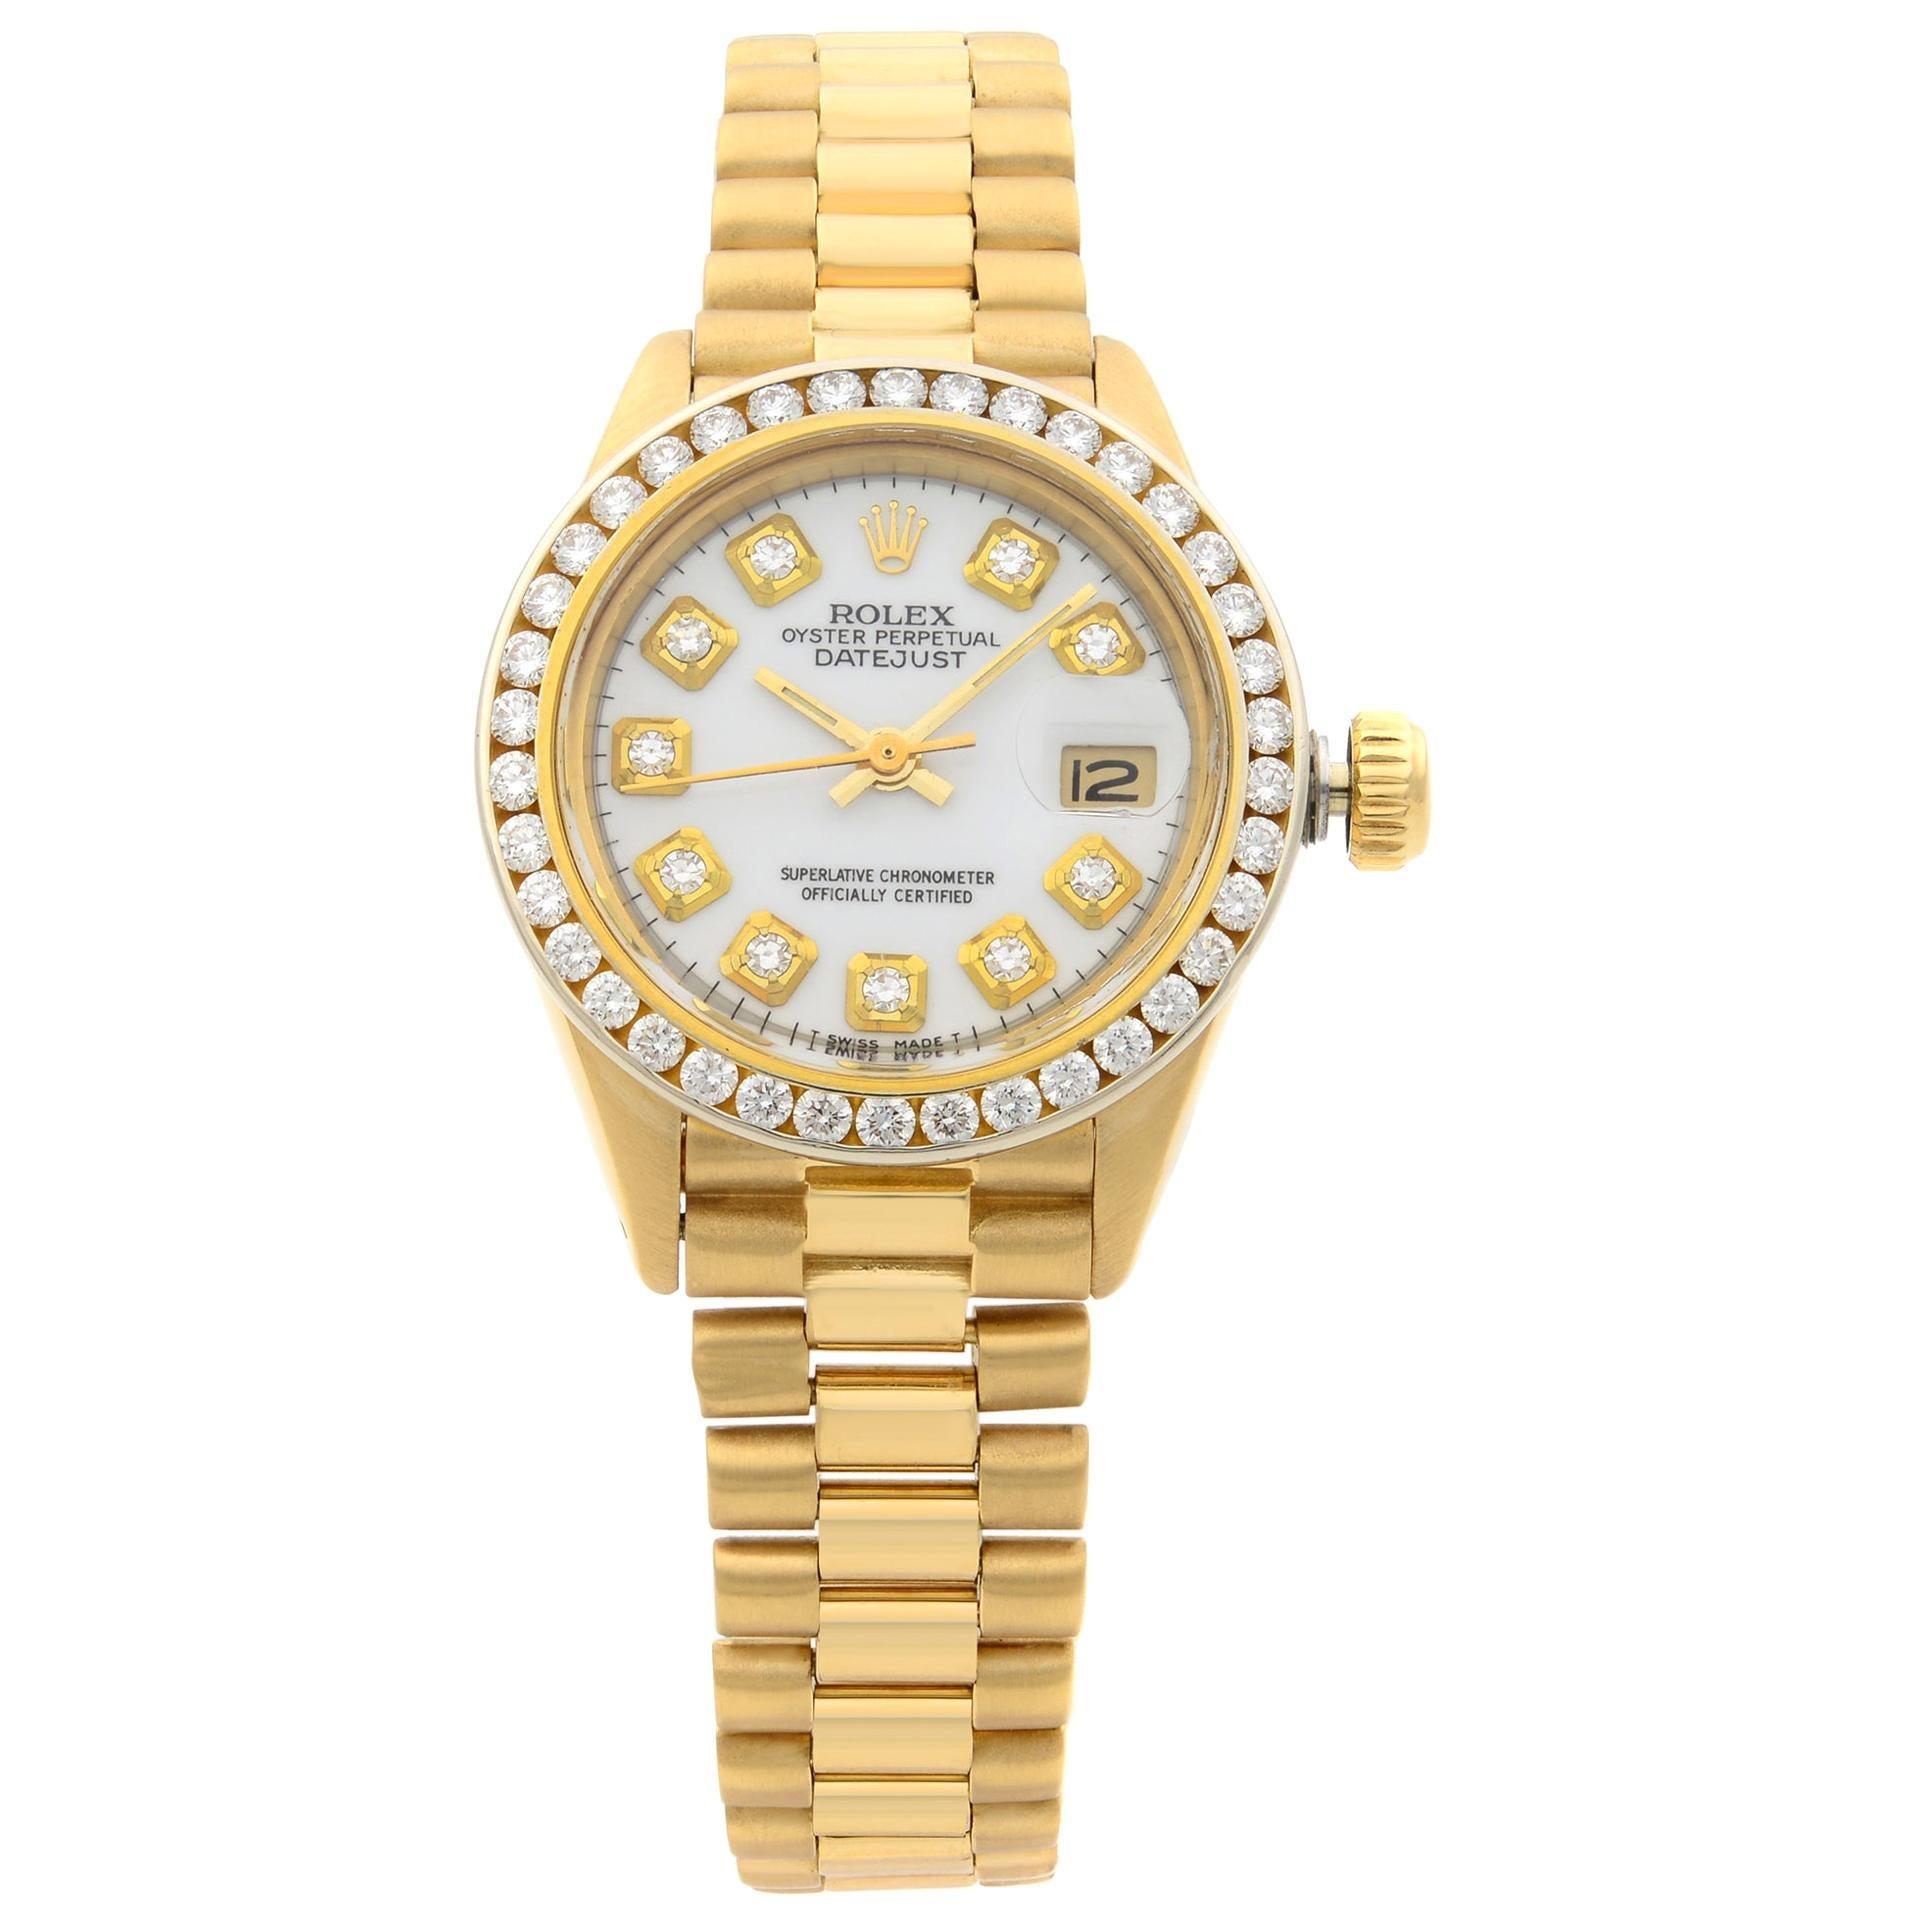 Rolex Datejust Aftermarket Diamond Bezel Yellow Gold Ladies Watch 6917